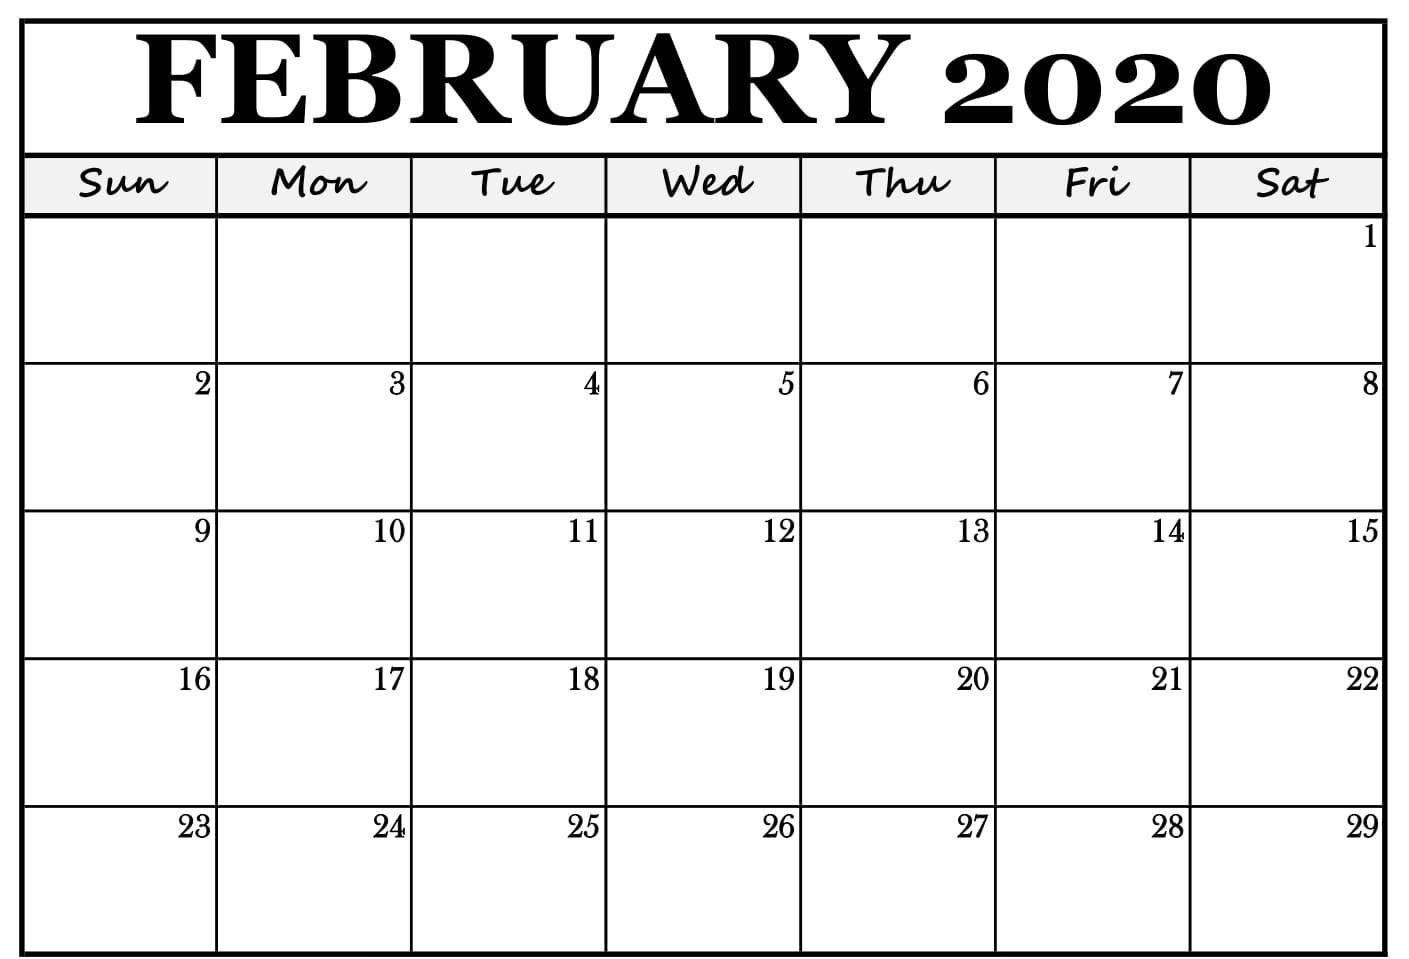 February 2020 Calendar Template Word